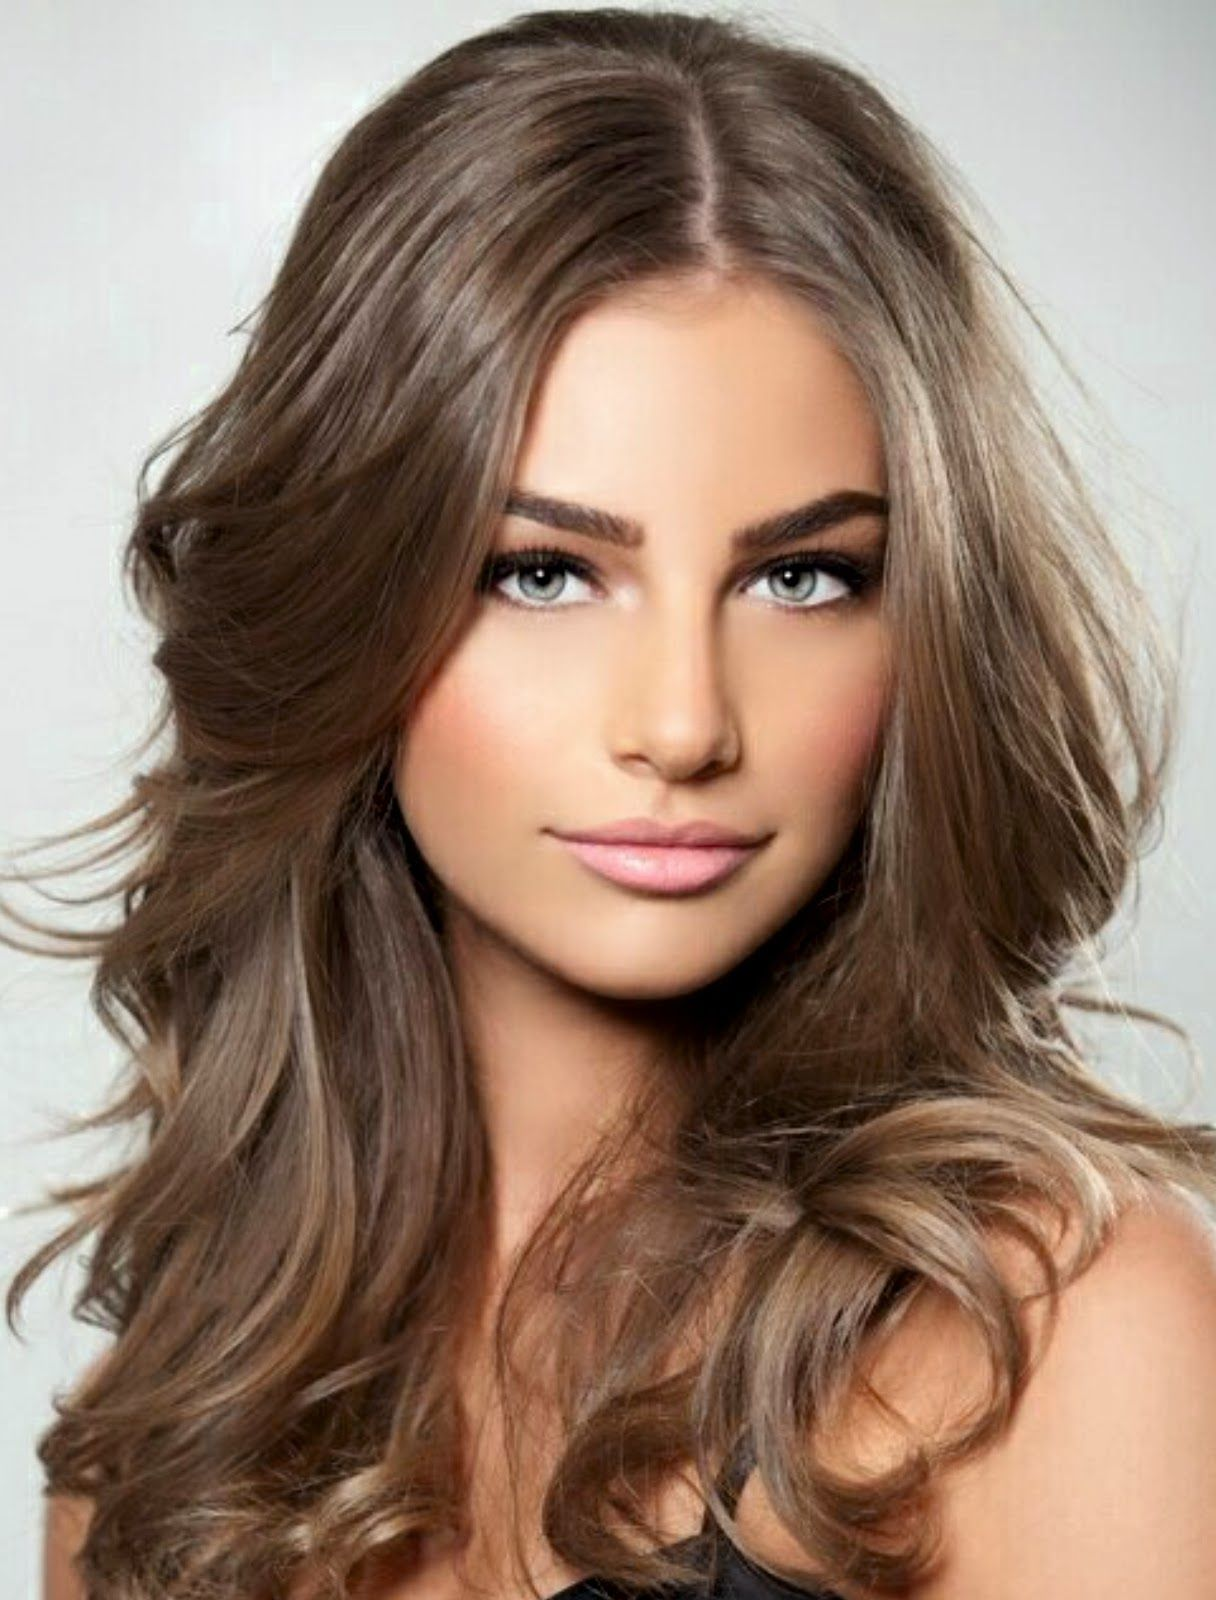 Dark Ashblonde All About The Eyes Langes Stufiges Haar Haar